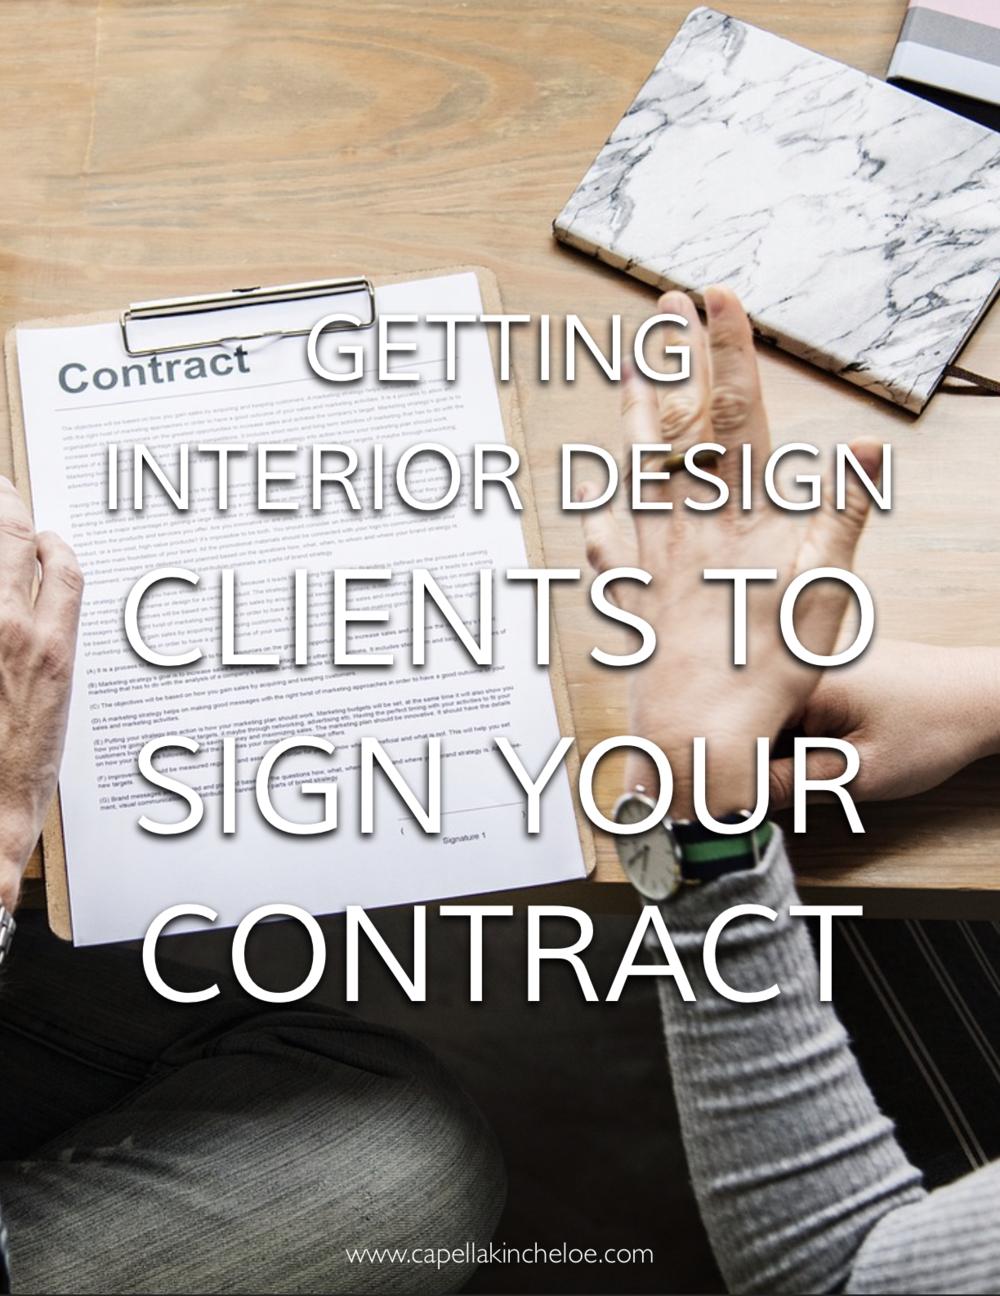 Getting interior design clients to sign your contract. #interiordesignbusiness #cktradesecrets #interiordesigncontract #interiordesignclients